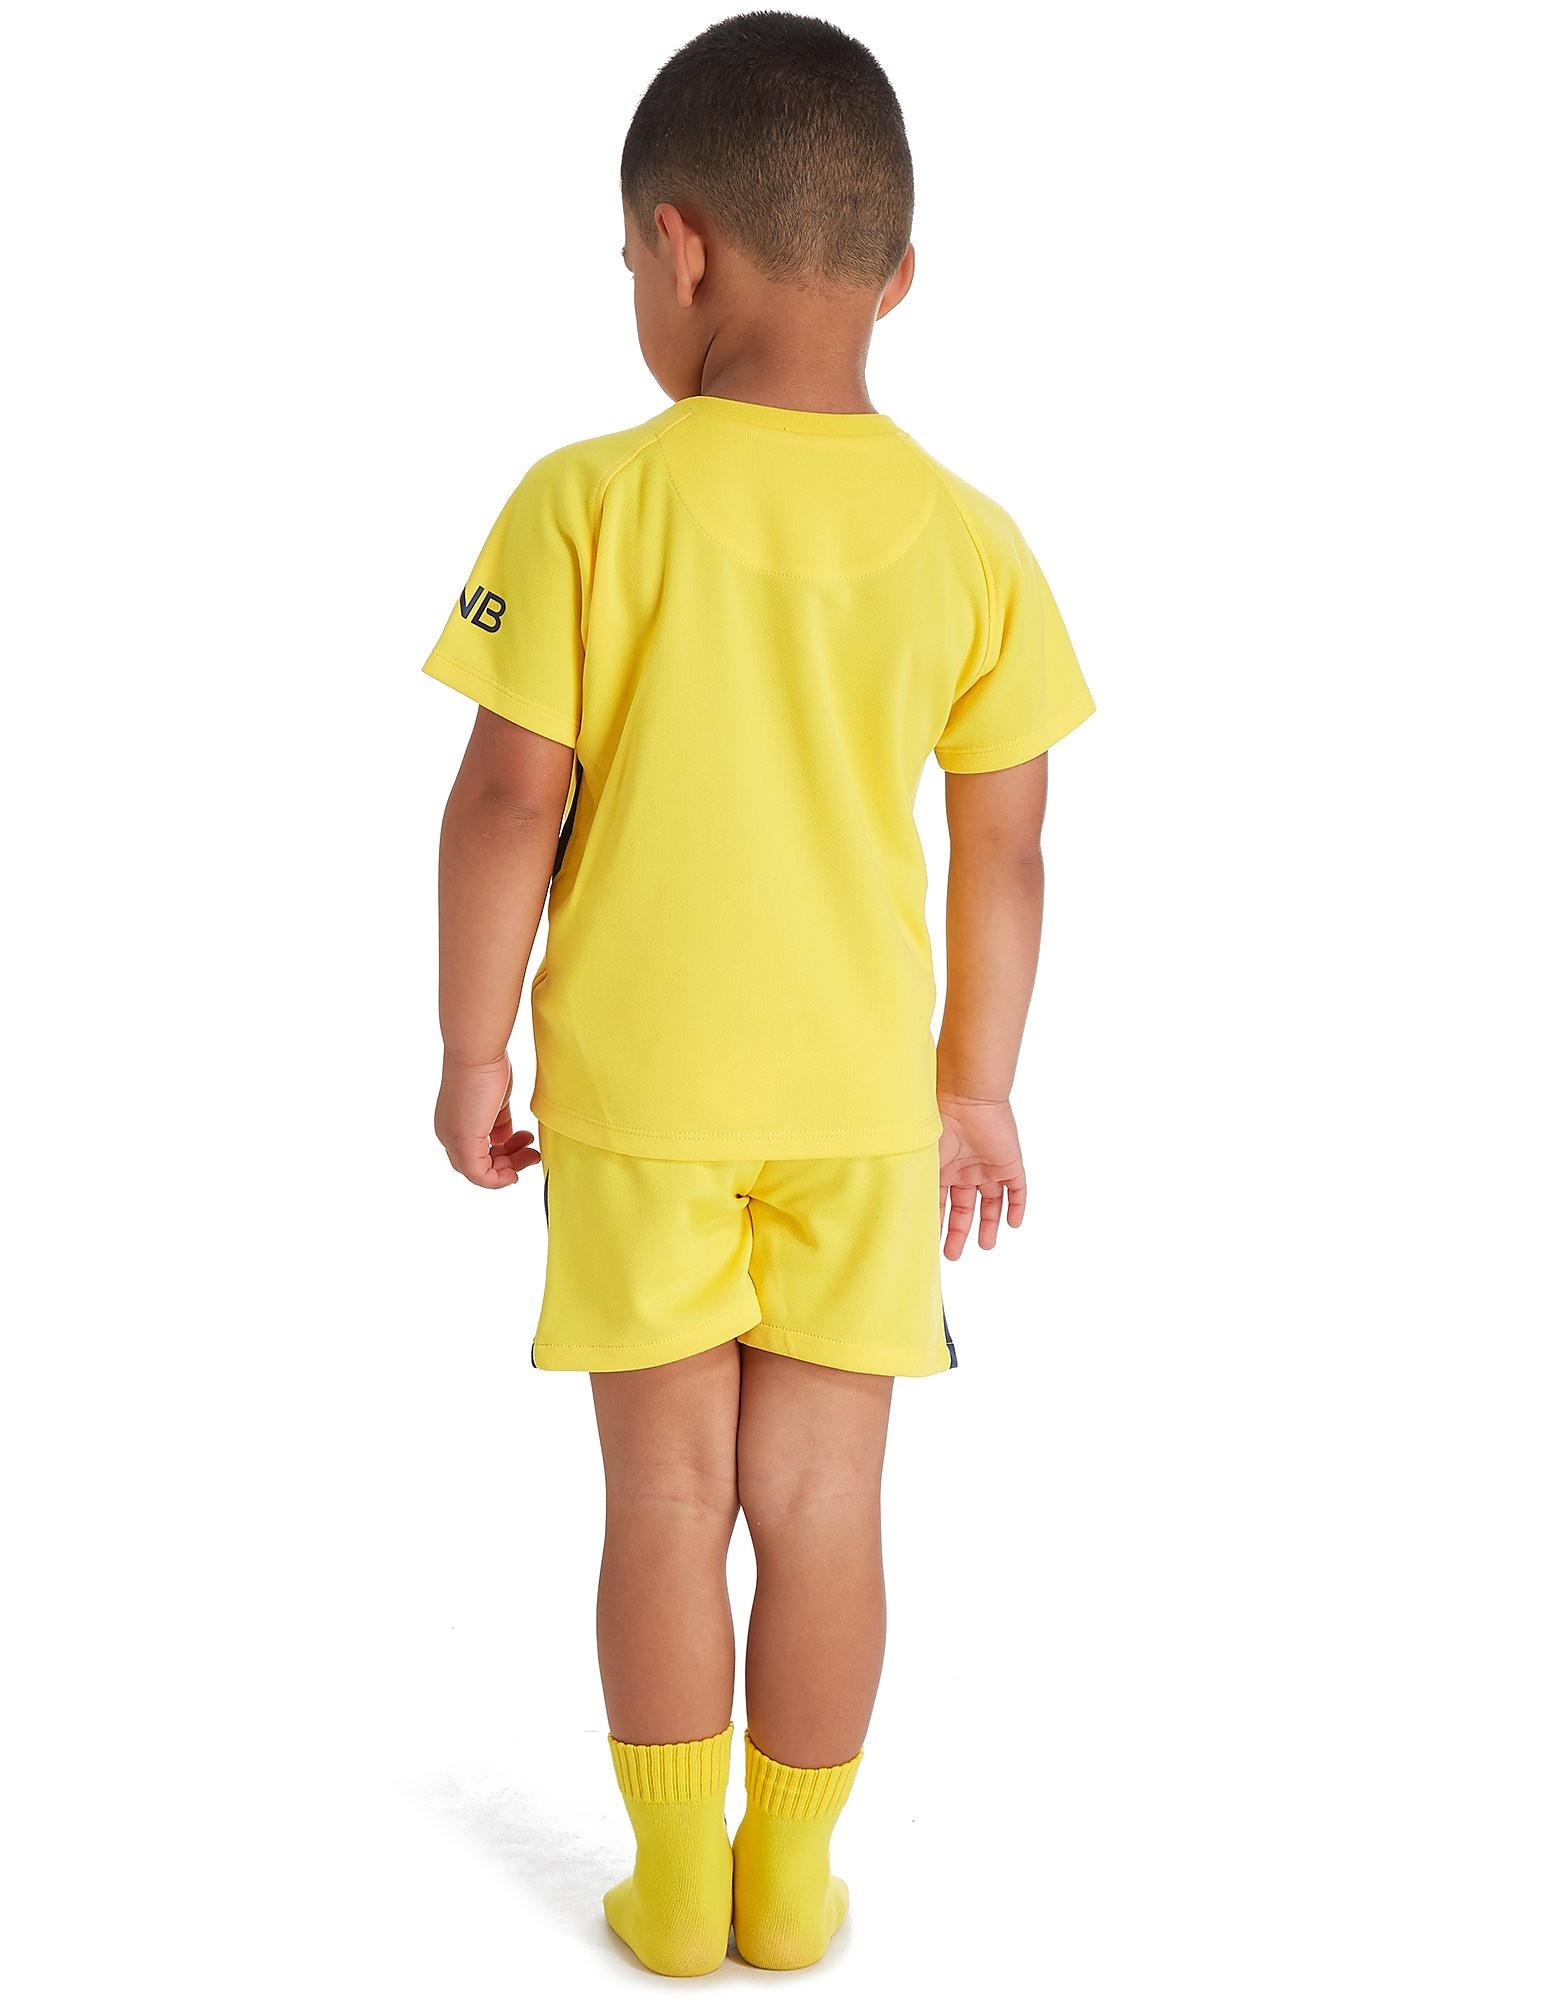 Nike Paris Saint Germain 2017 Away Kit Infant